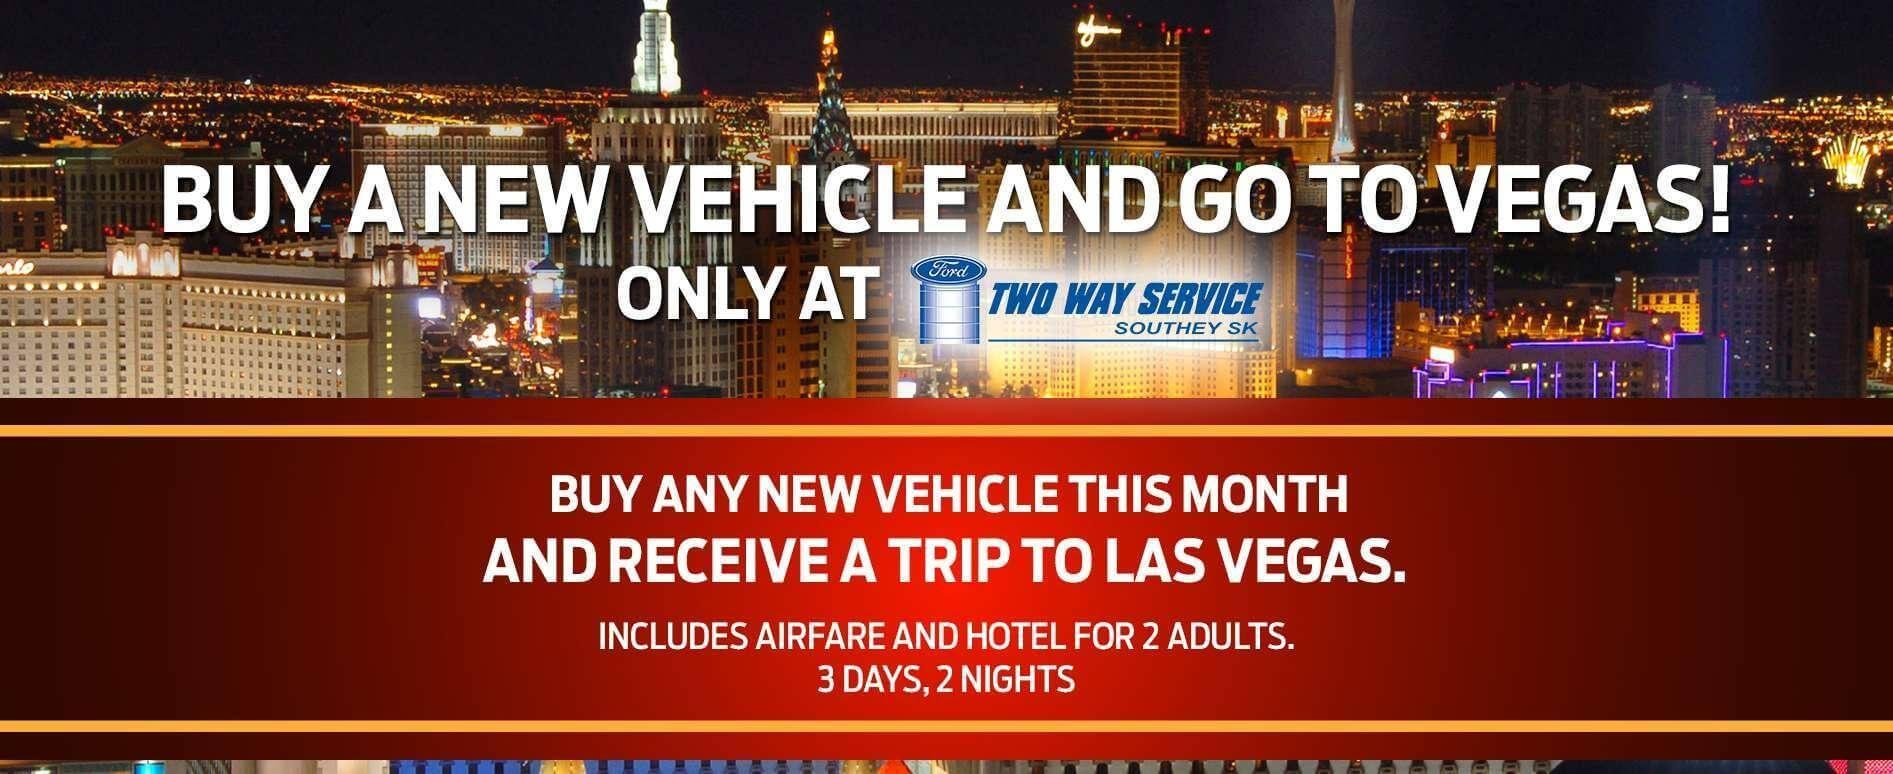 Las Vegas Two Way Service Ford